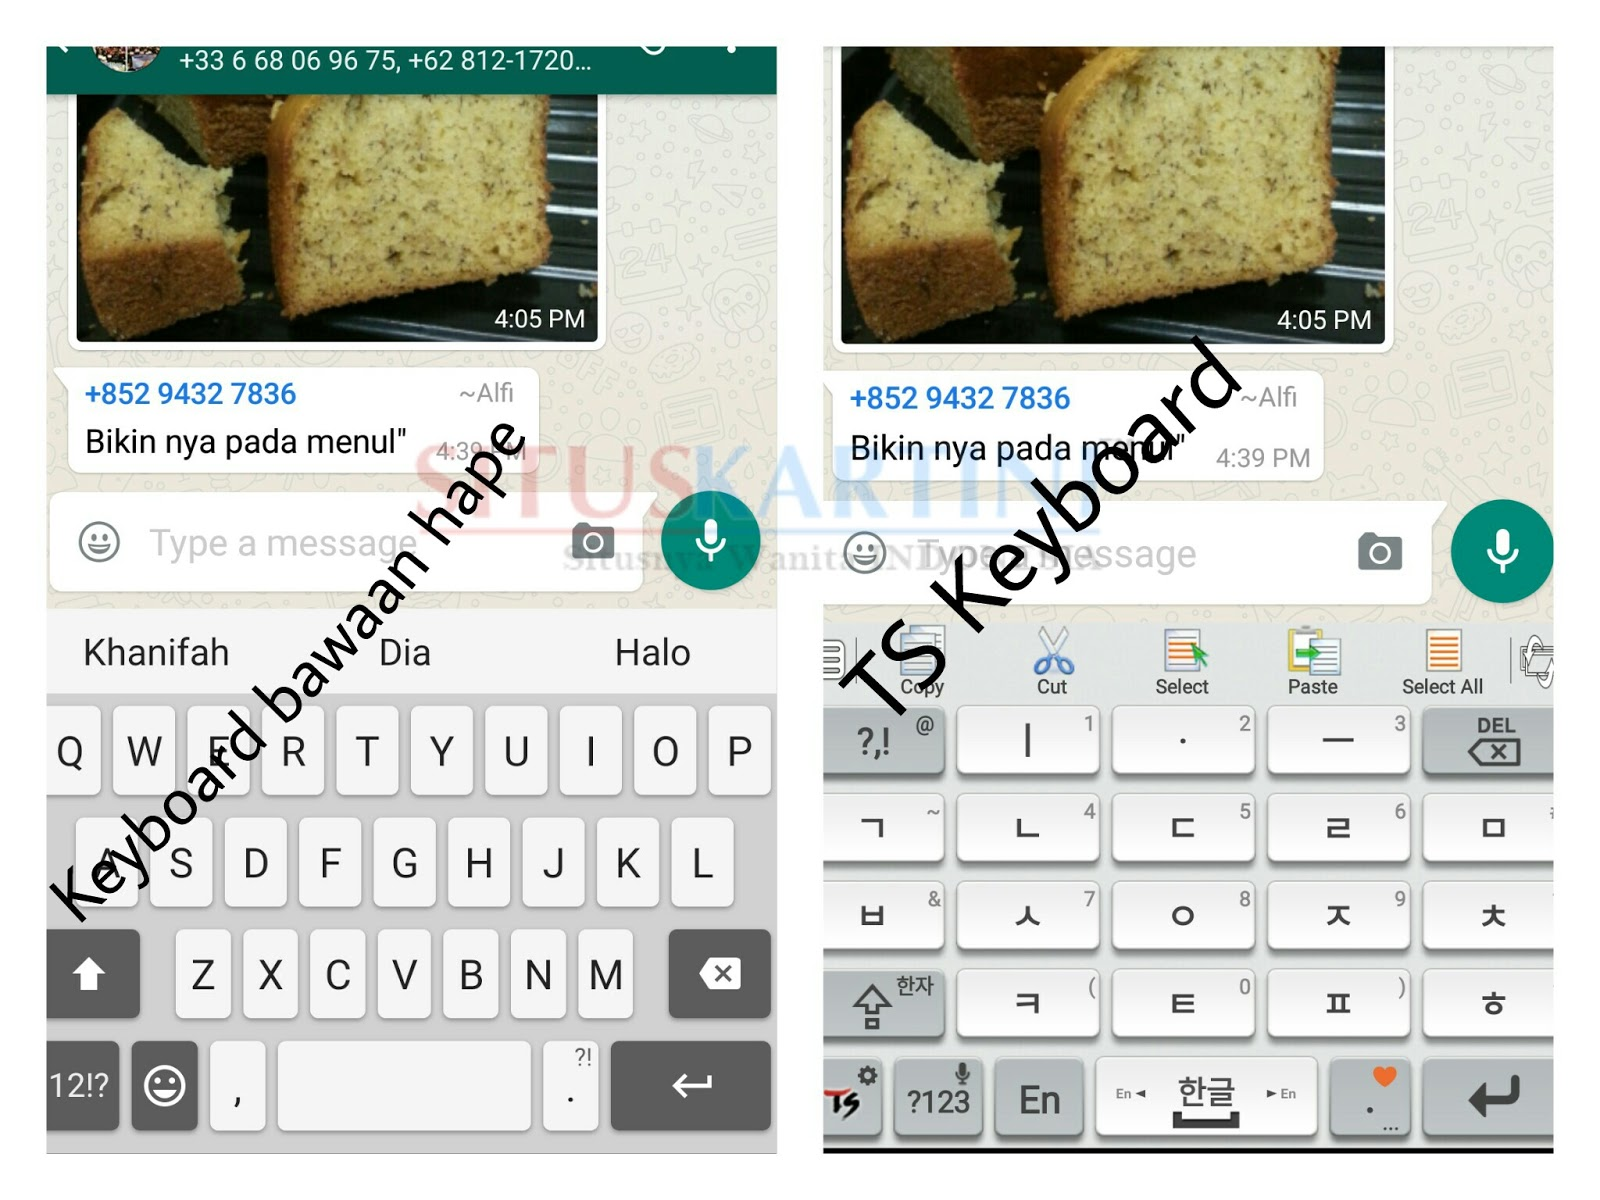 Cara mengaktifkan Memasang Keyboard Hangul •œê¸€ atau Tulisan Korea di Android mu